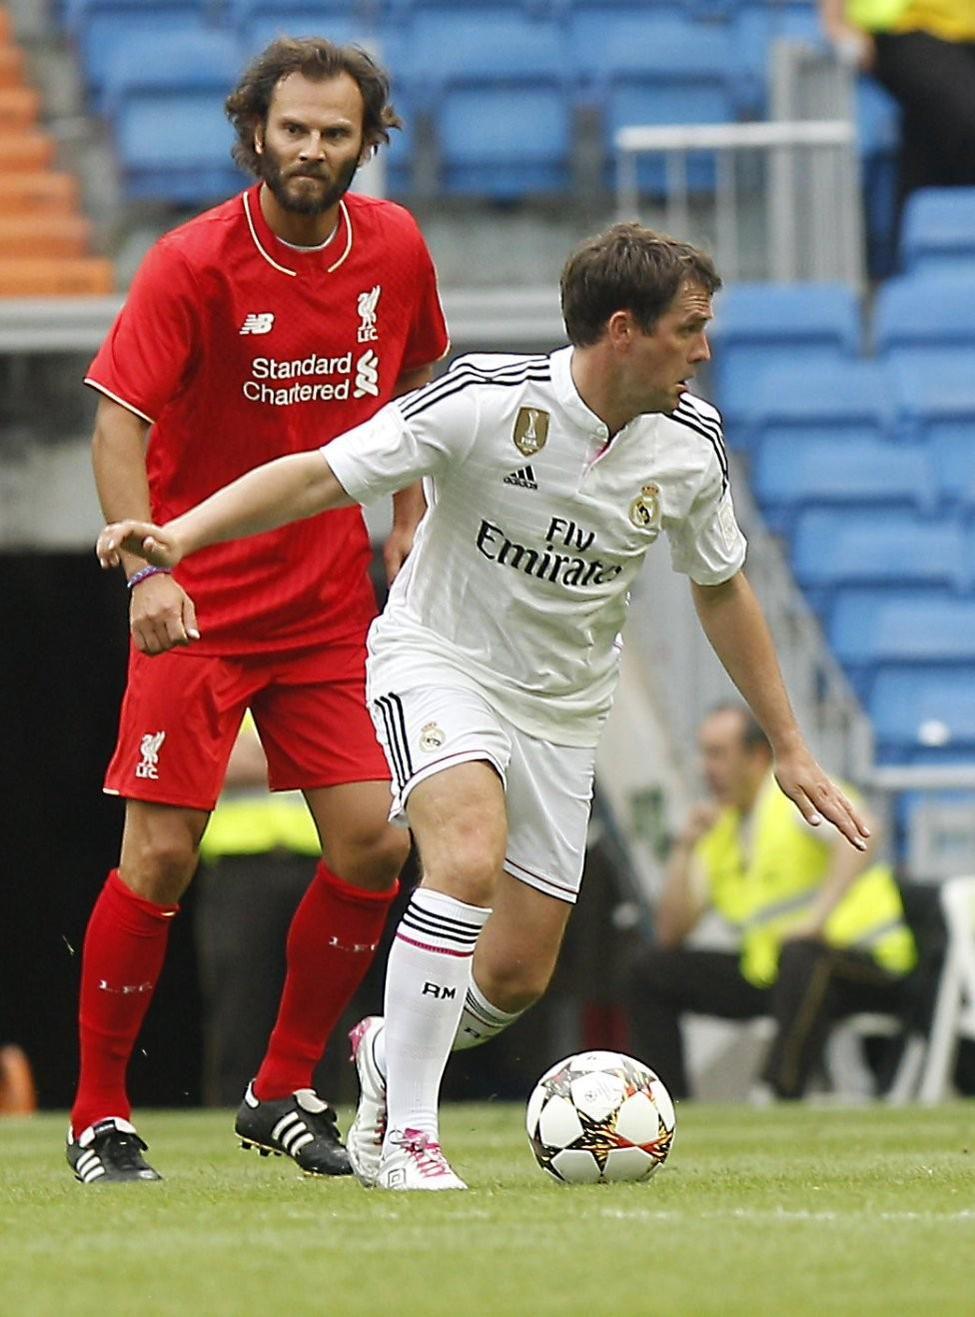 Michael Owen Real Madrid vs Liverpool legends 2015 | Real ...